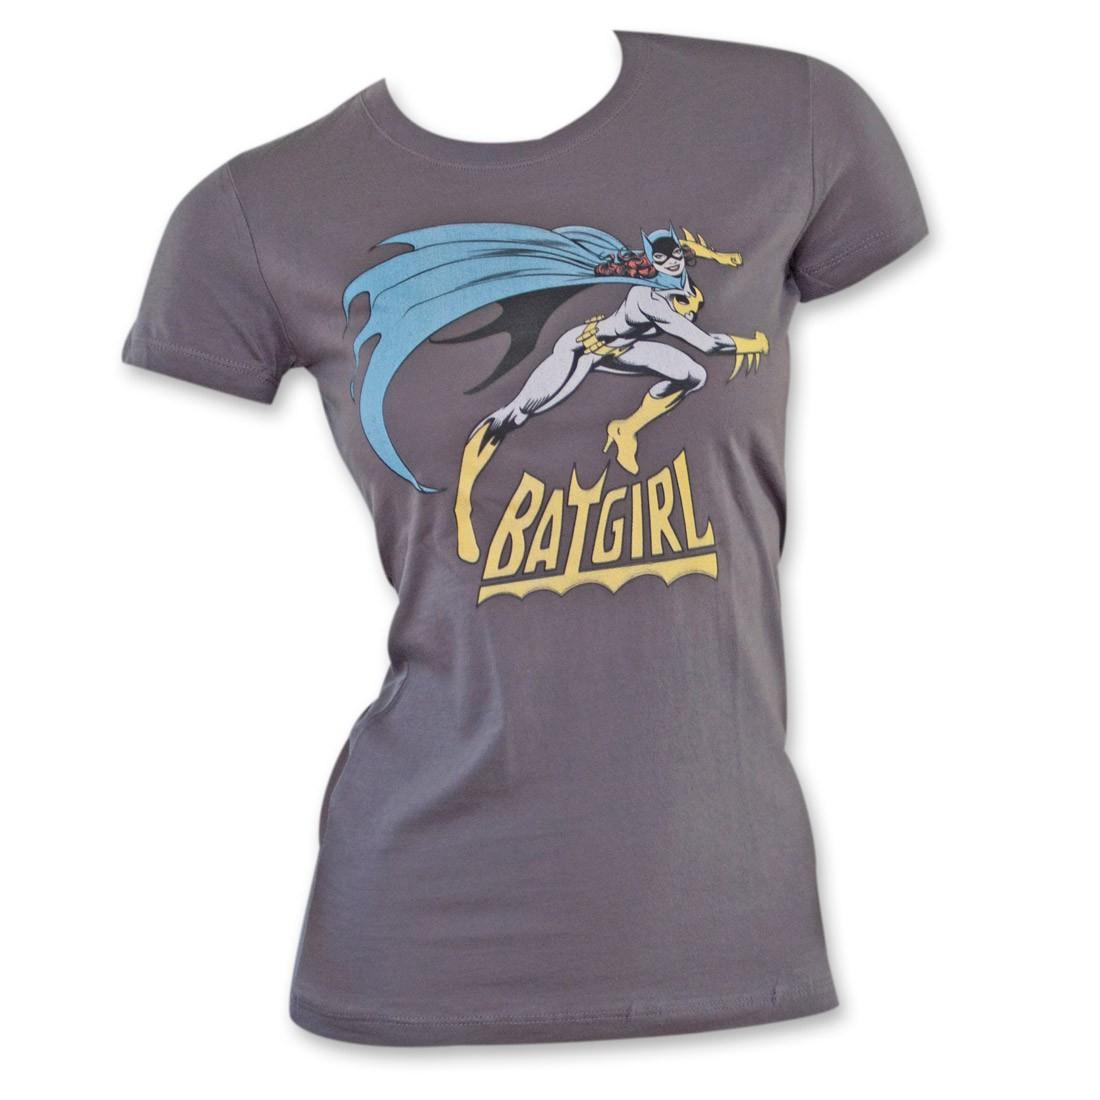 Batgirl Women's T-Shirt - Grey